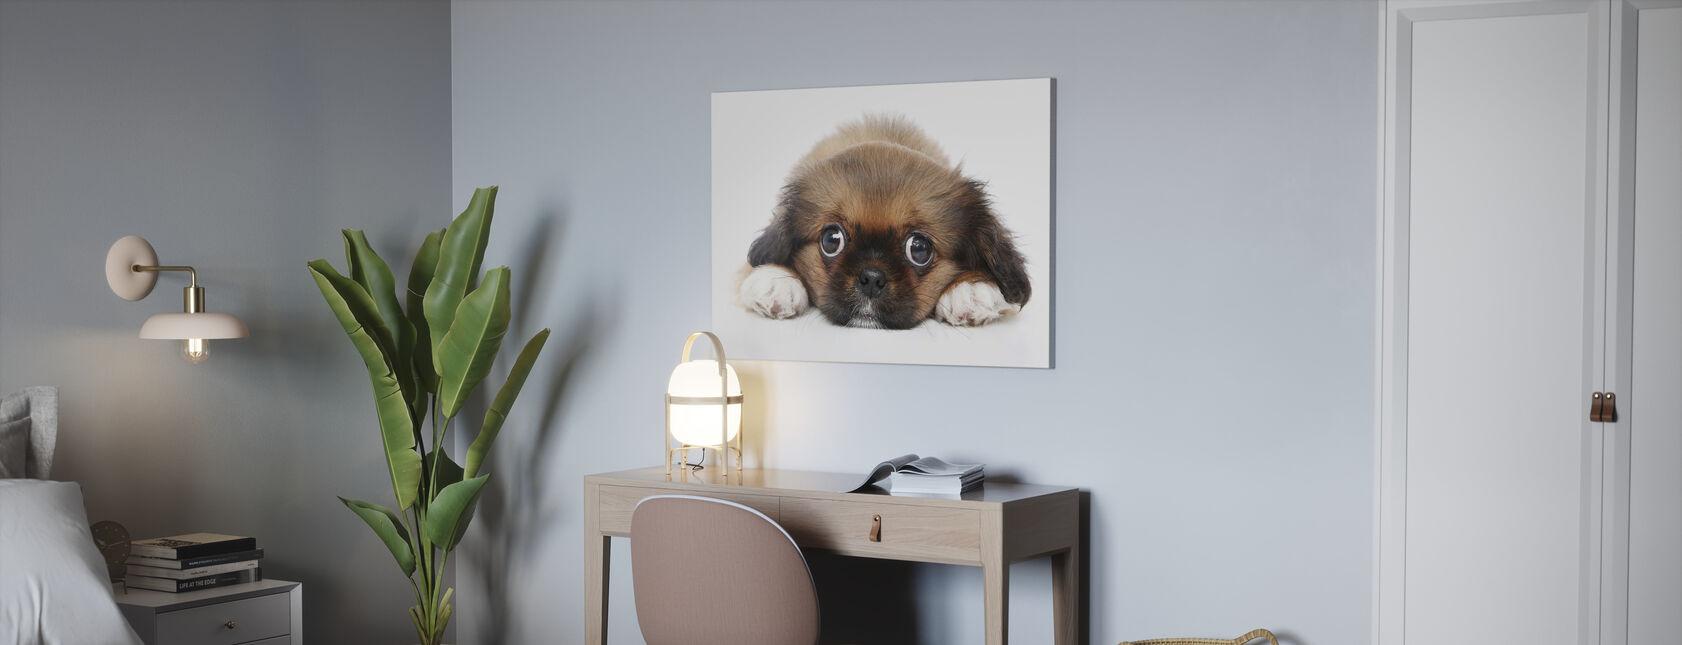 Big Eyes - Canvas print - Office